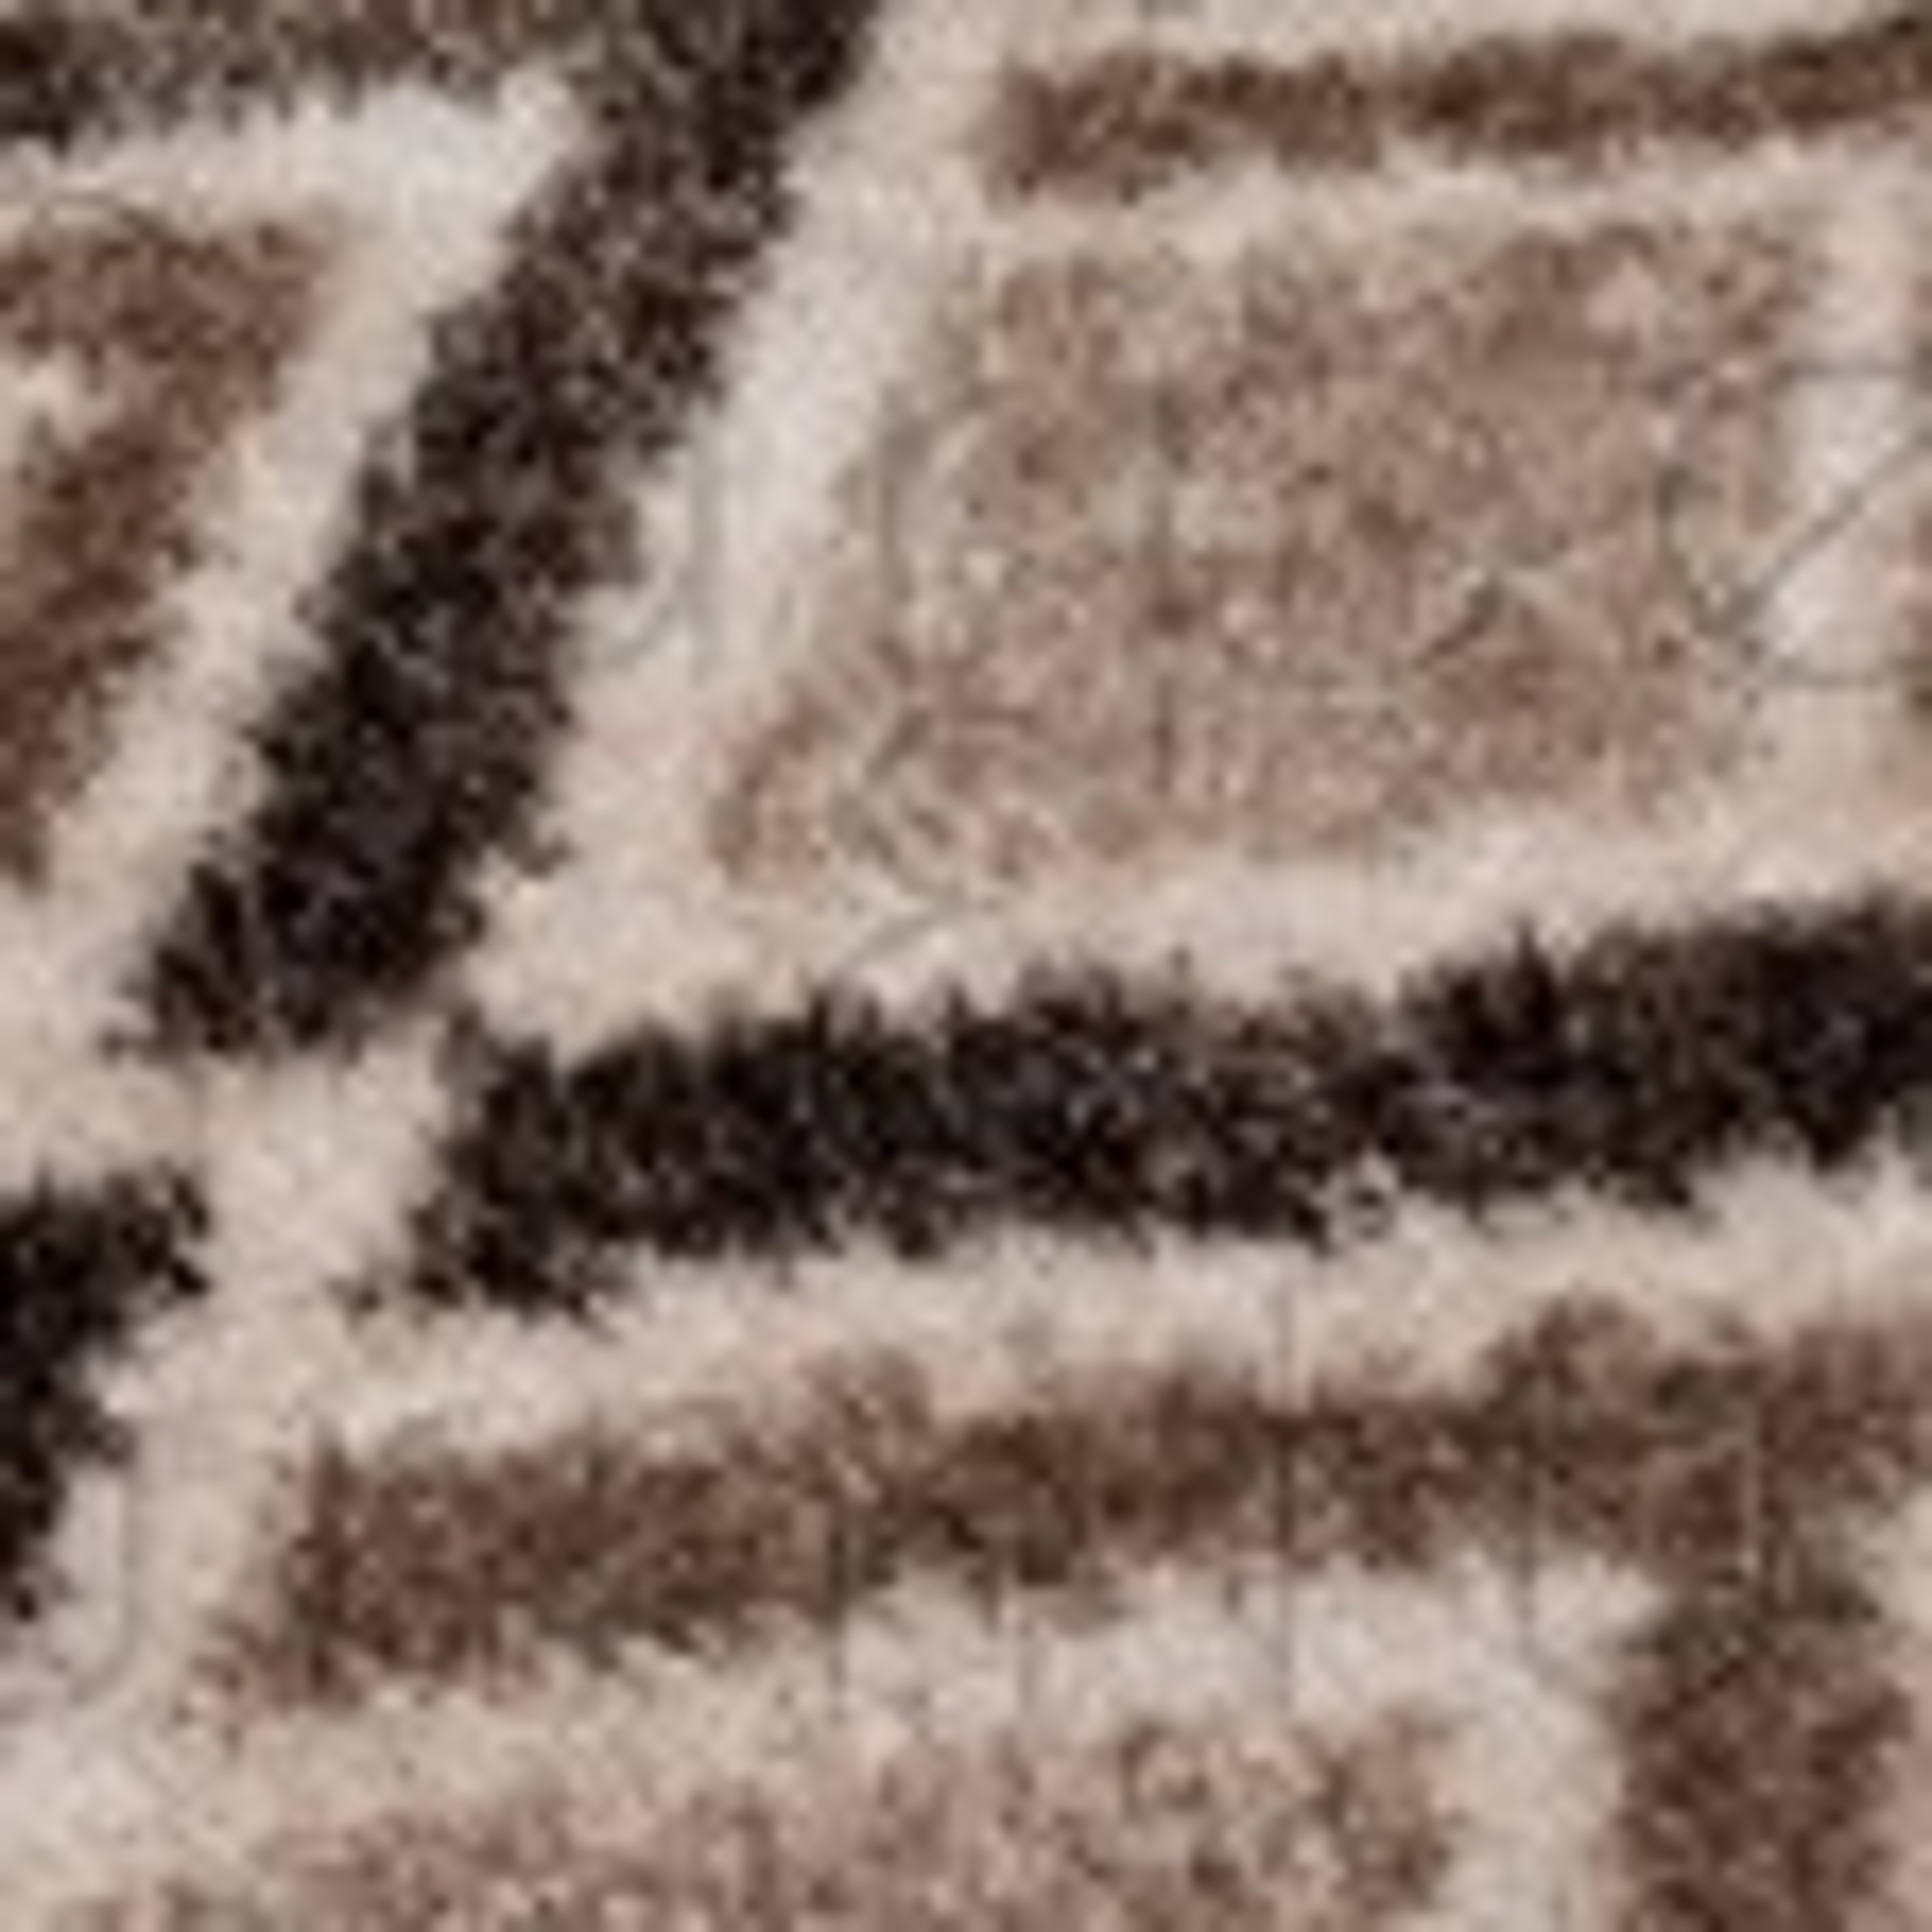 "Velvet Bijoux Rug - Beige Brown - Size 80 x 150 cm (2'8"" x 5')"